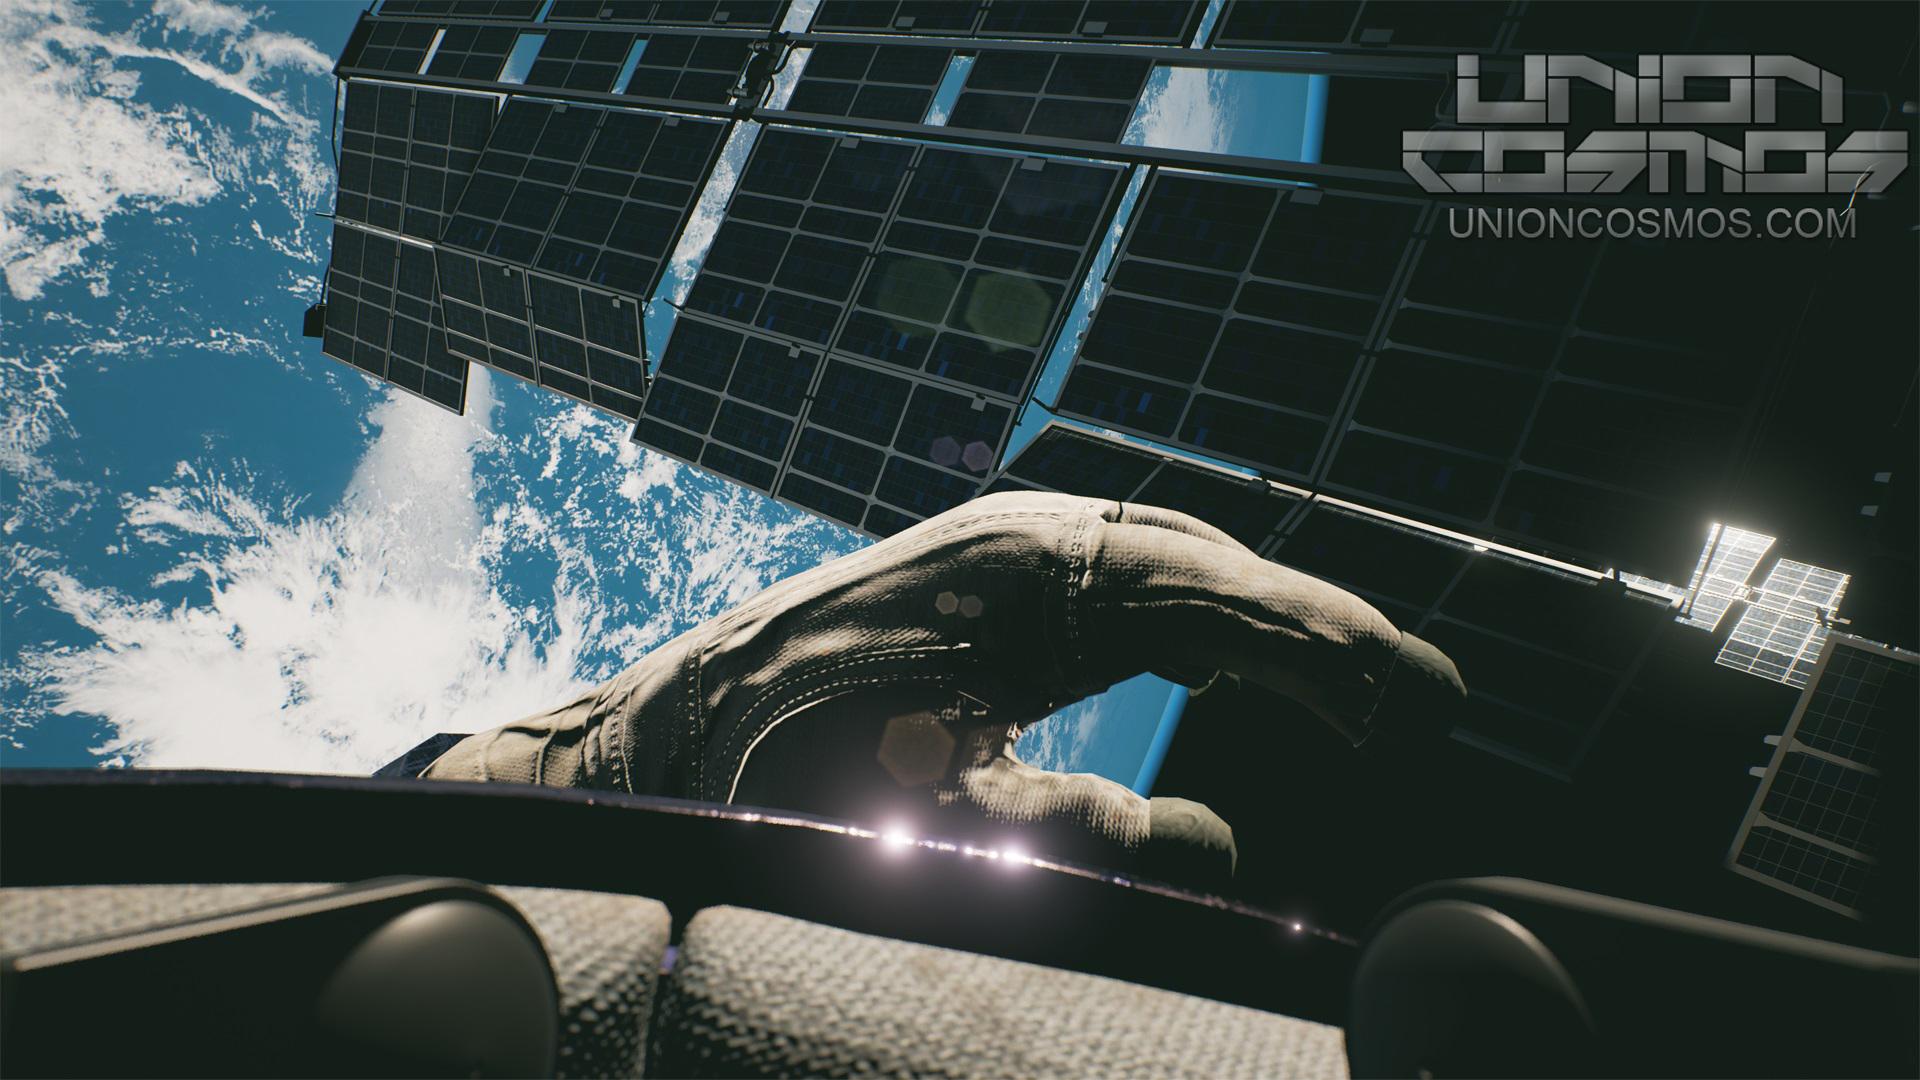 Union Cosmos Outreach screenshot copia